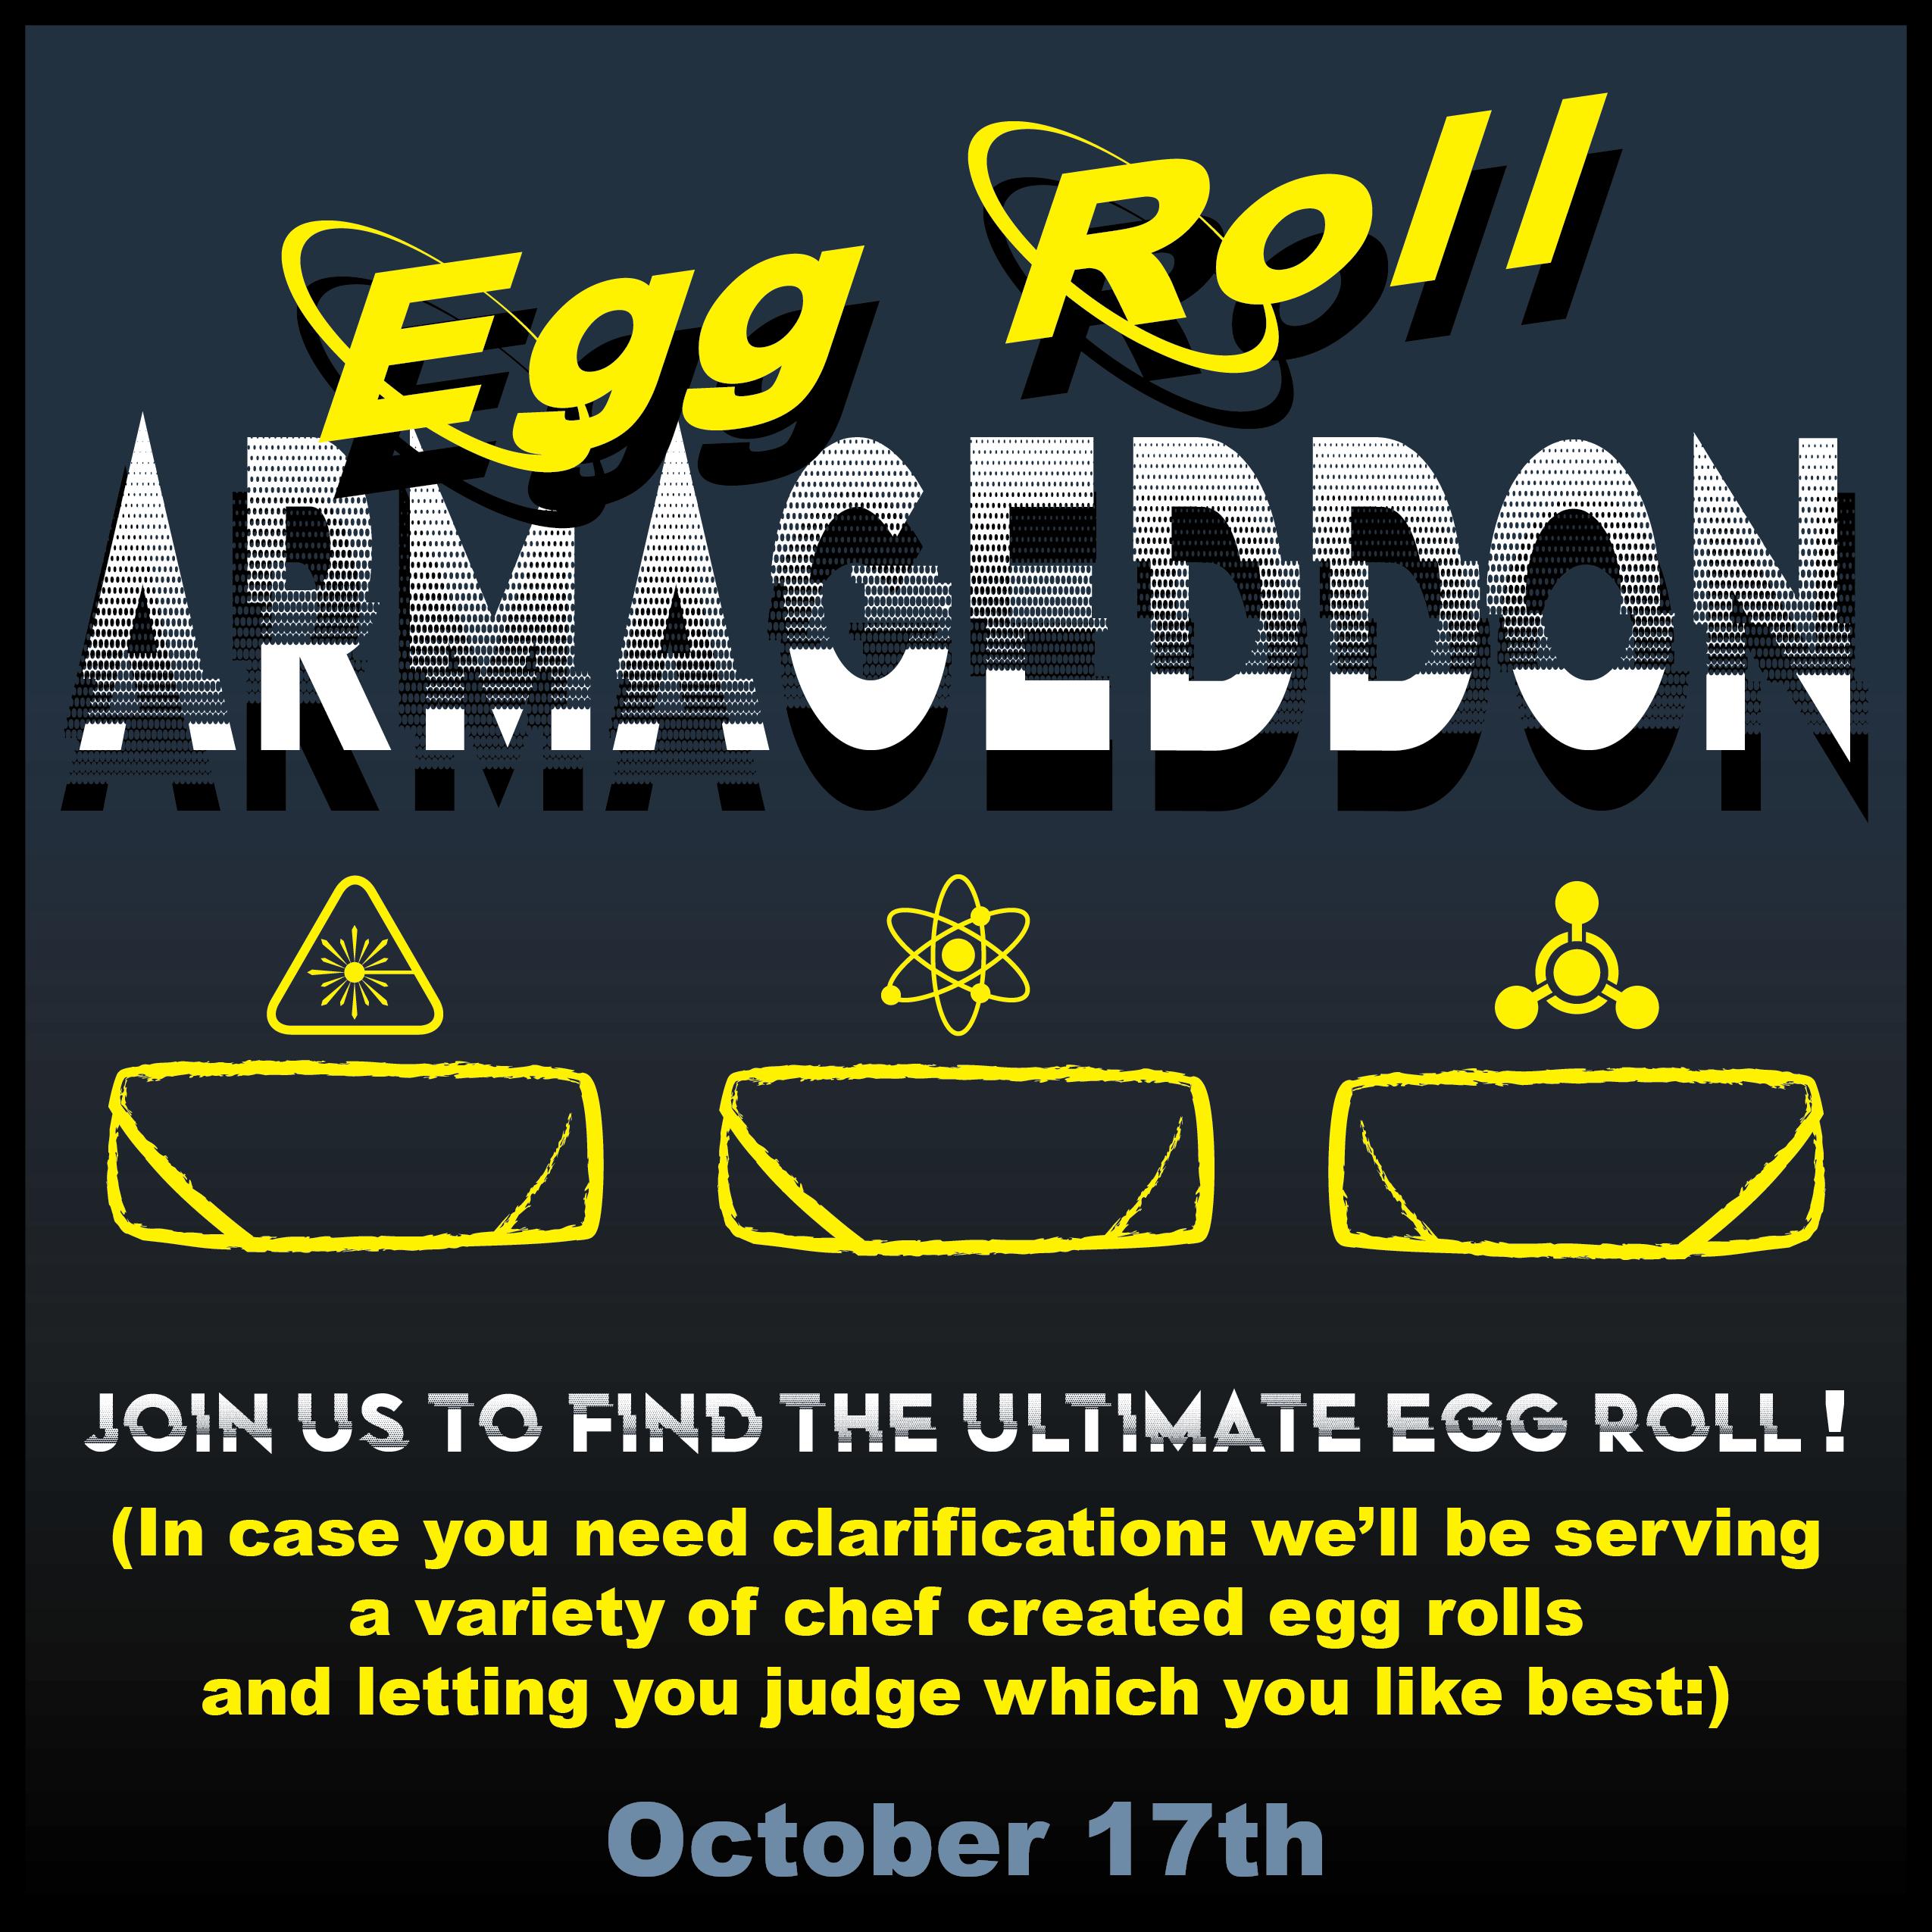 EggRollArmageddonsquare